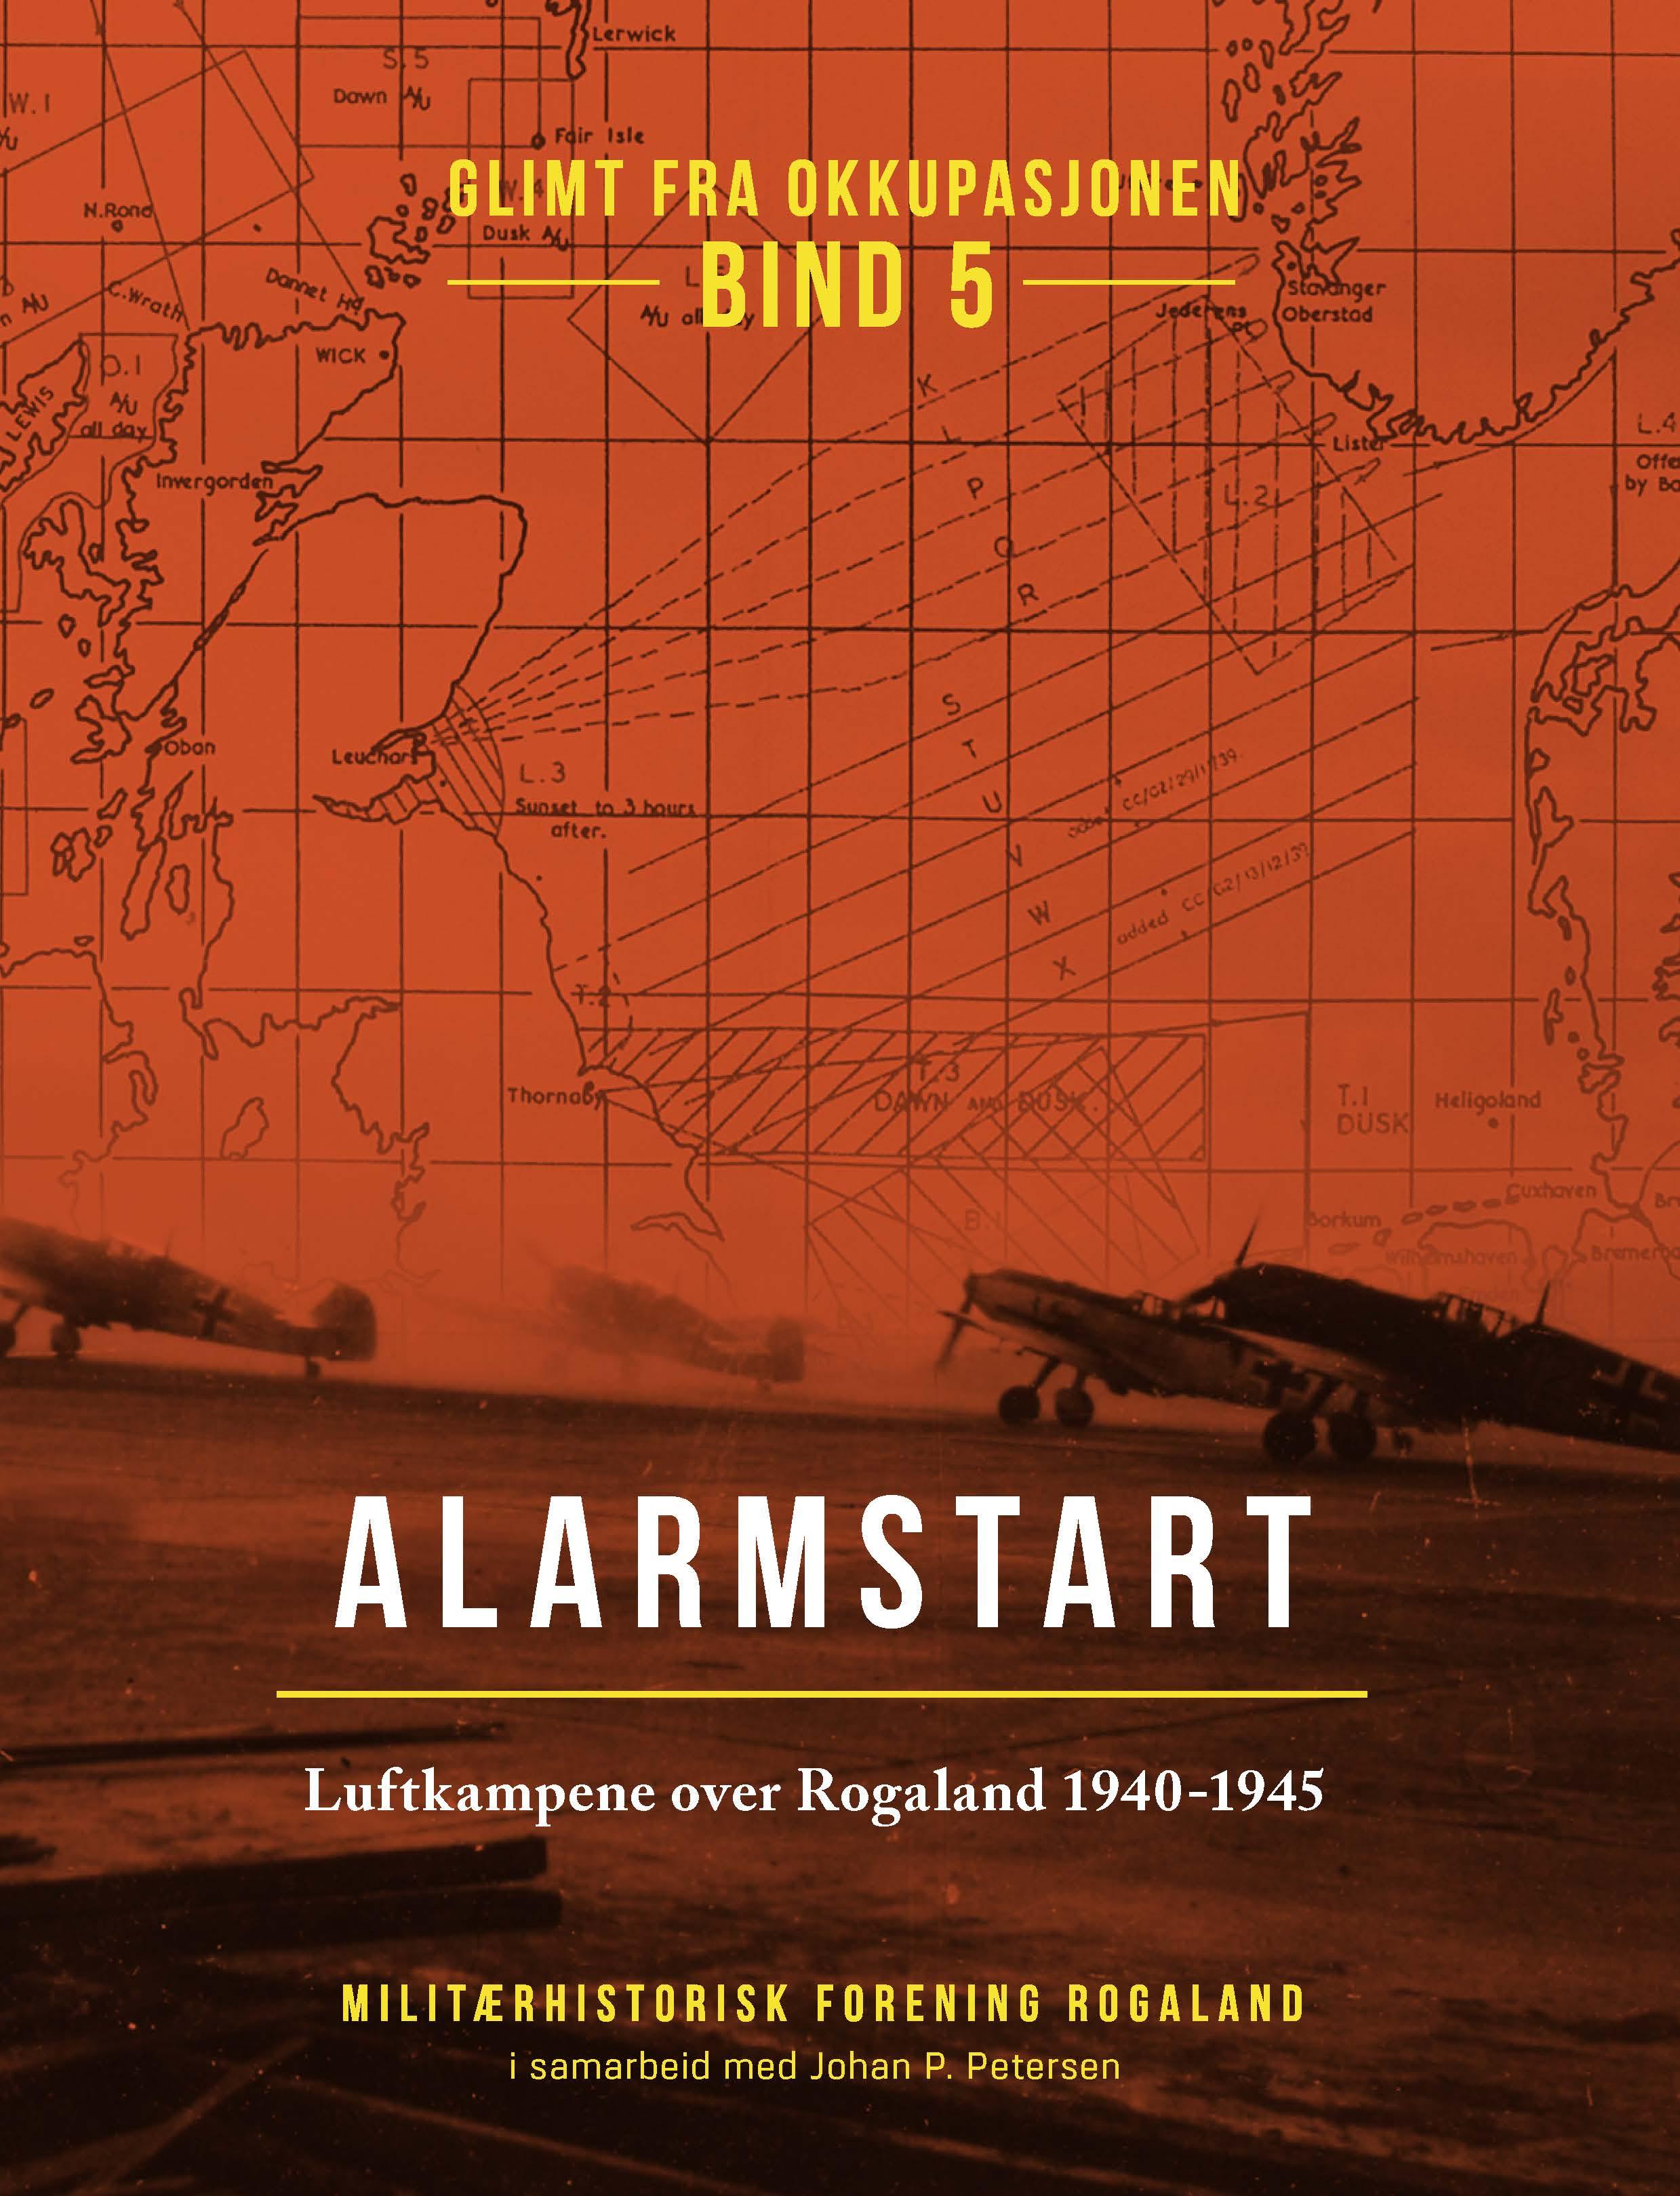 Alarmstart. Luftkampene over Rogaland 1940-1945